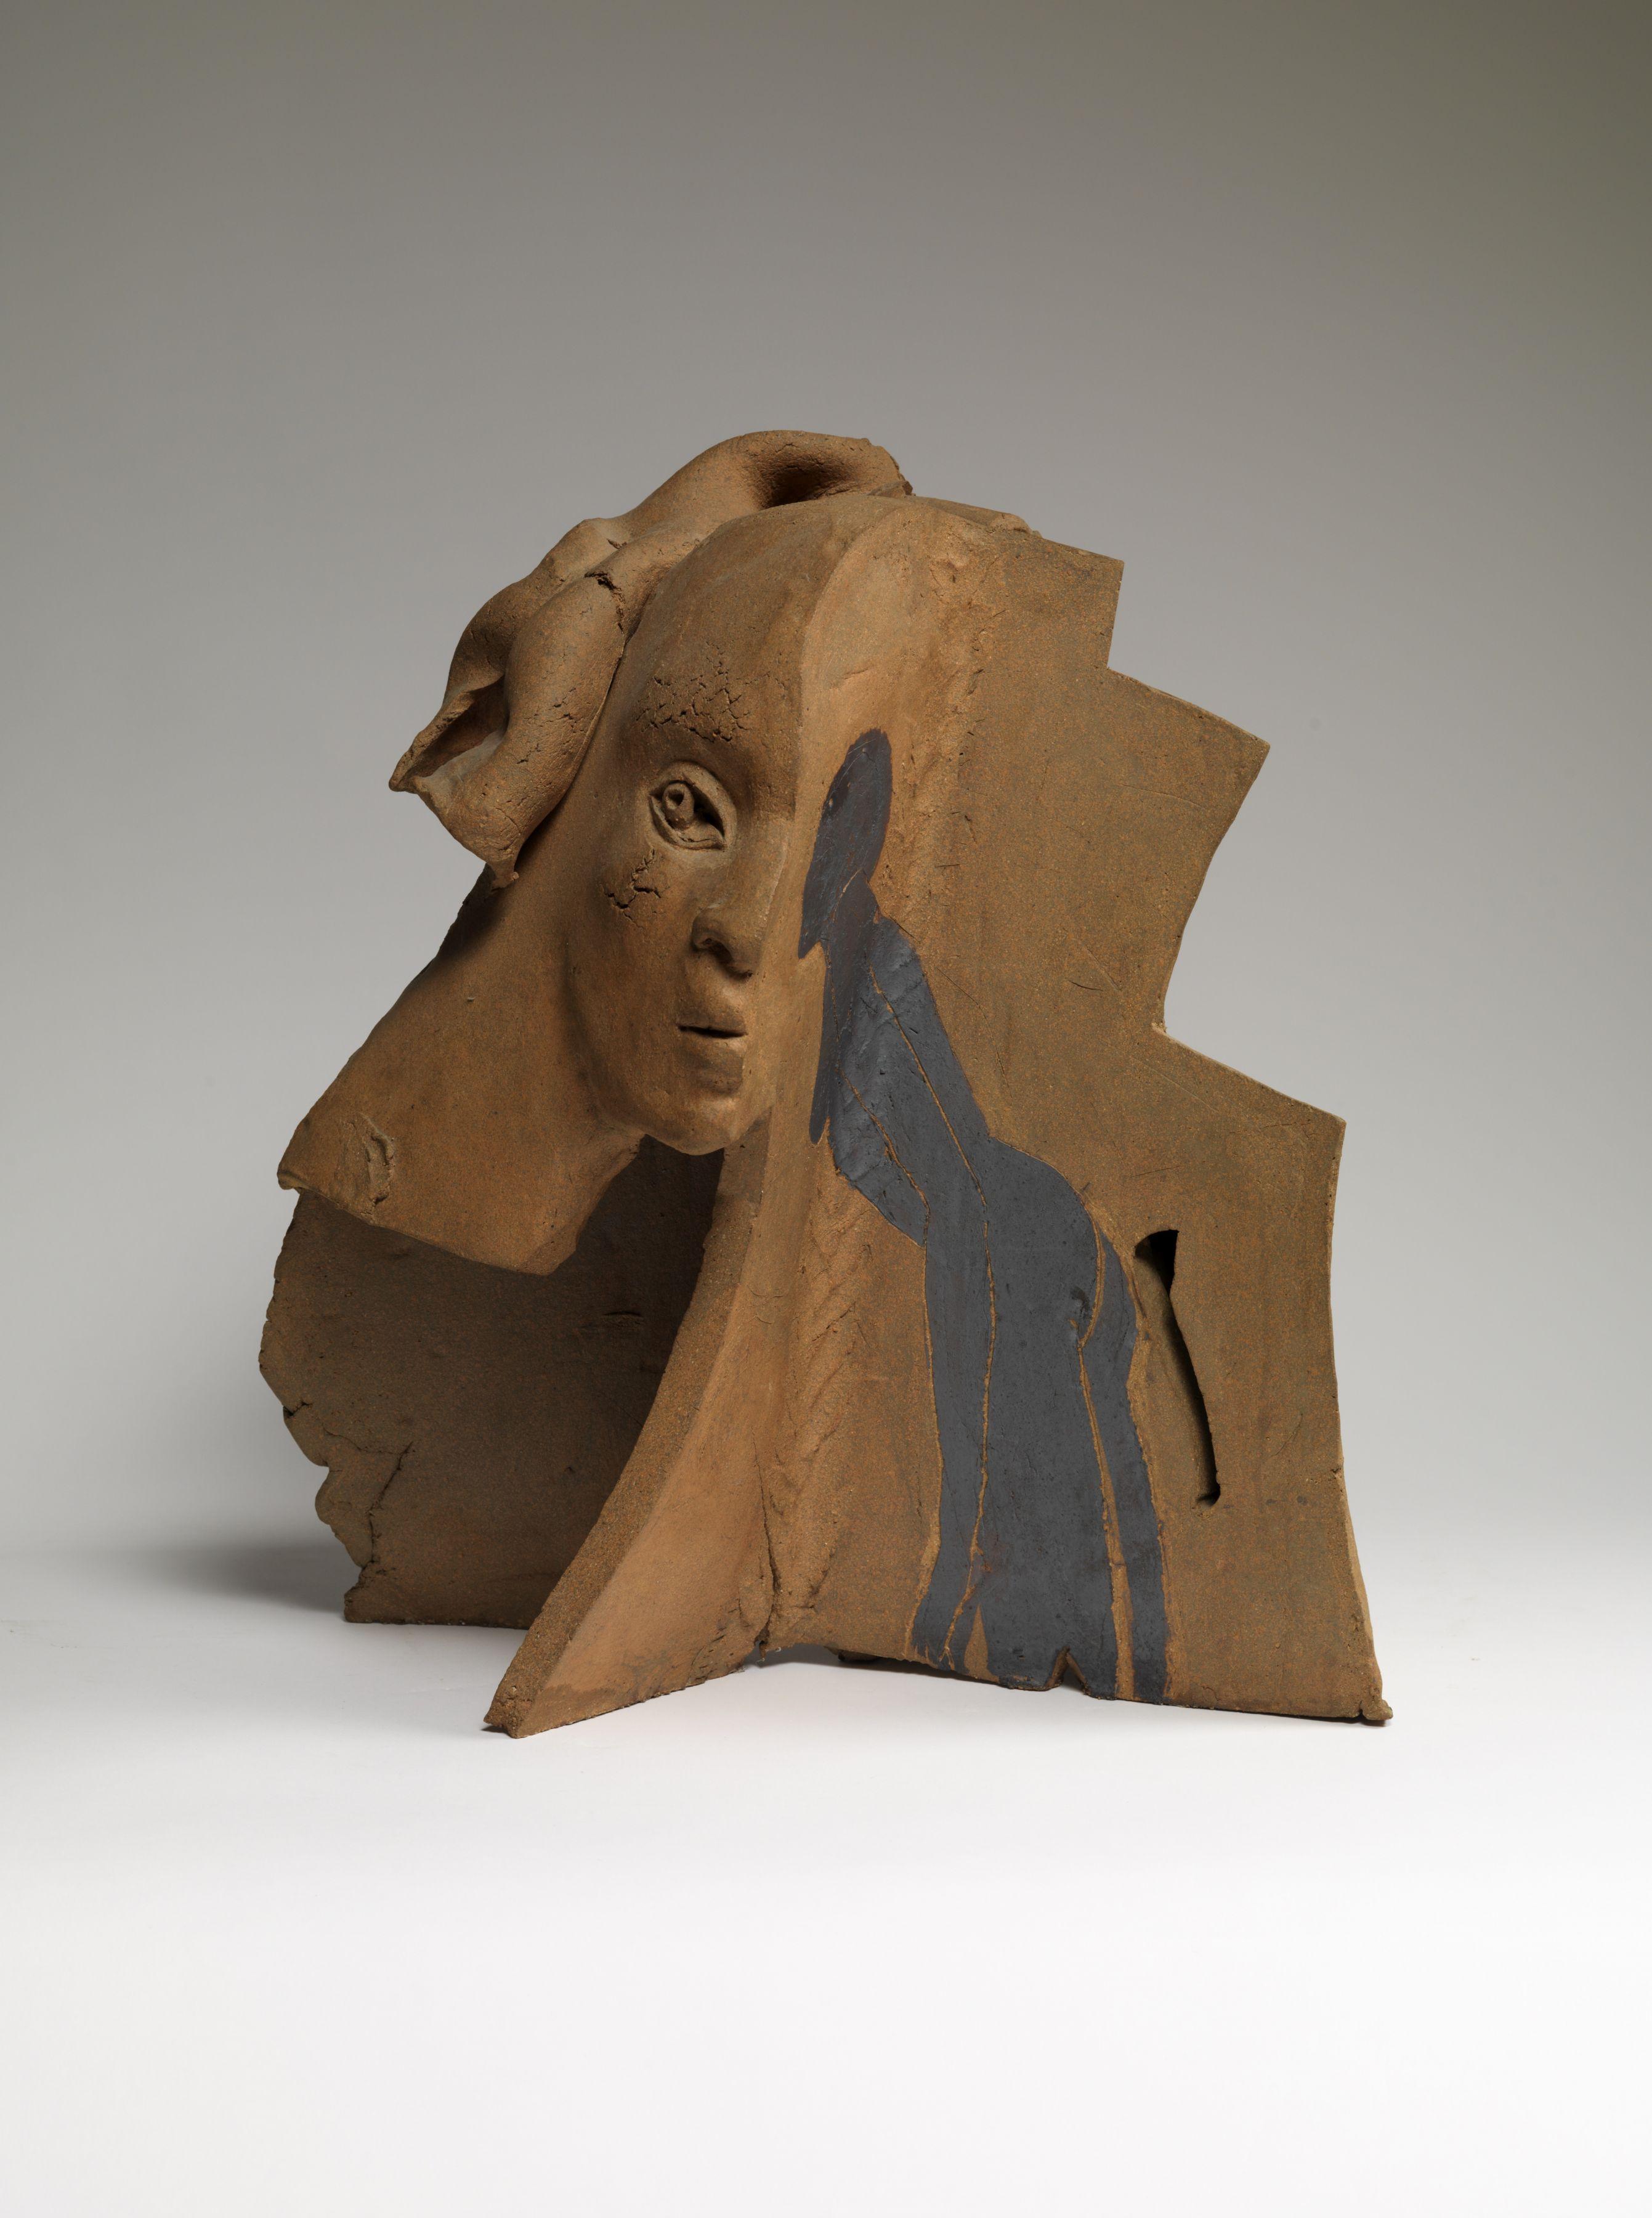 Nighthead, 1971 Ceramic with acrylic